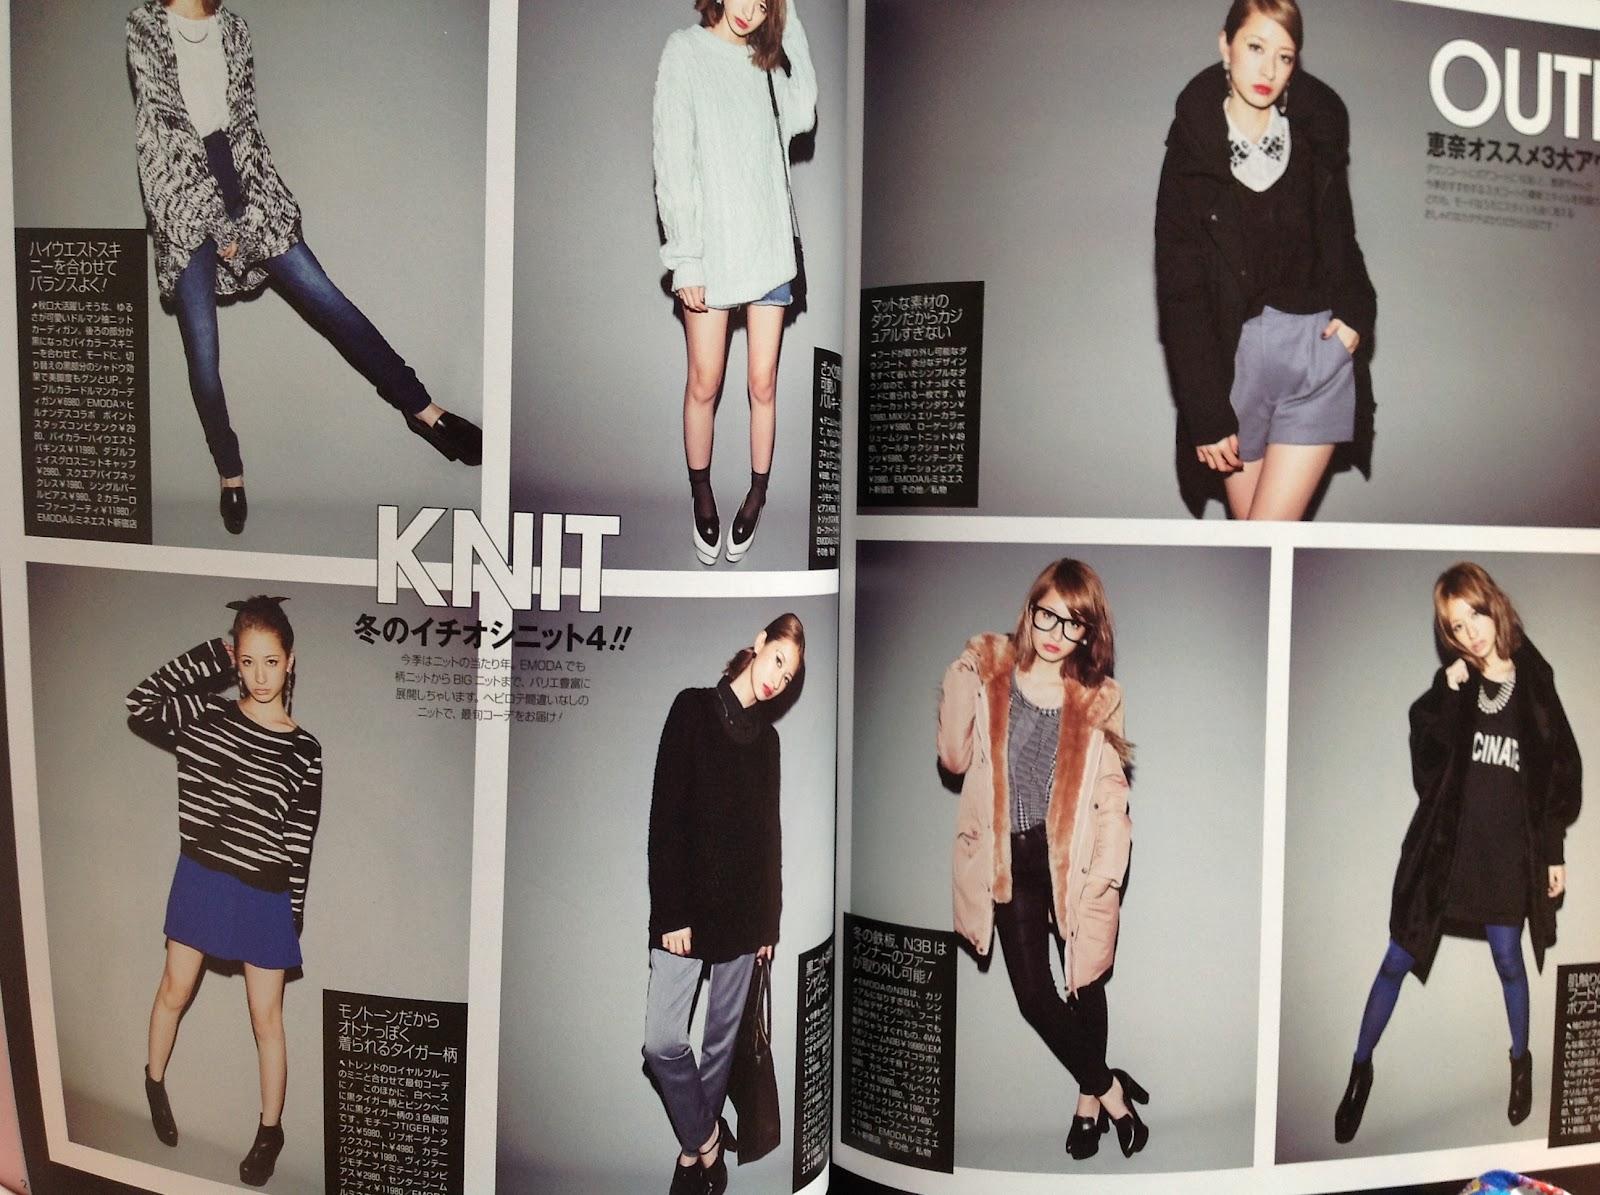 curls and mindy: Japanese Fashion Magazine ViVi + clutch ...